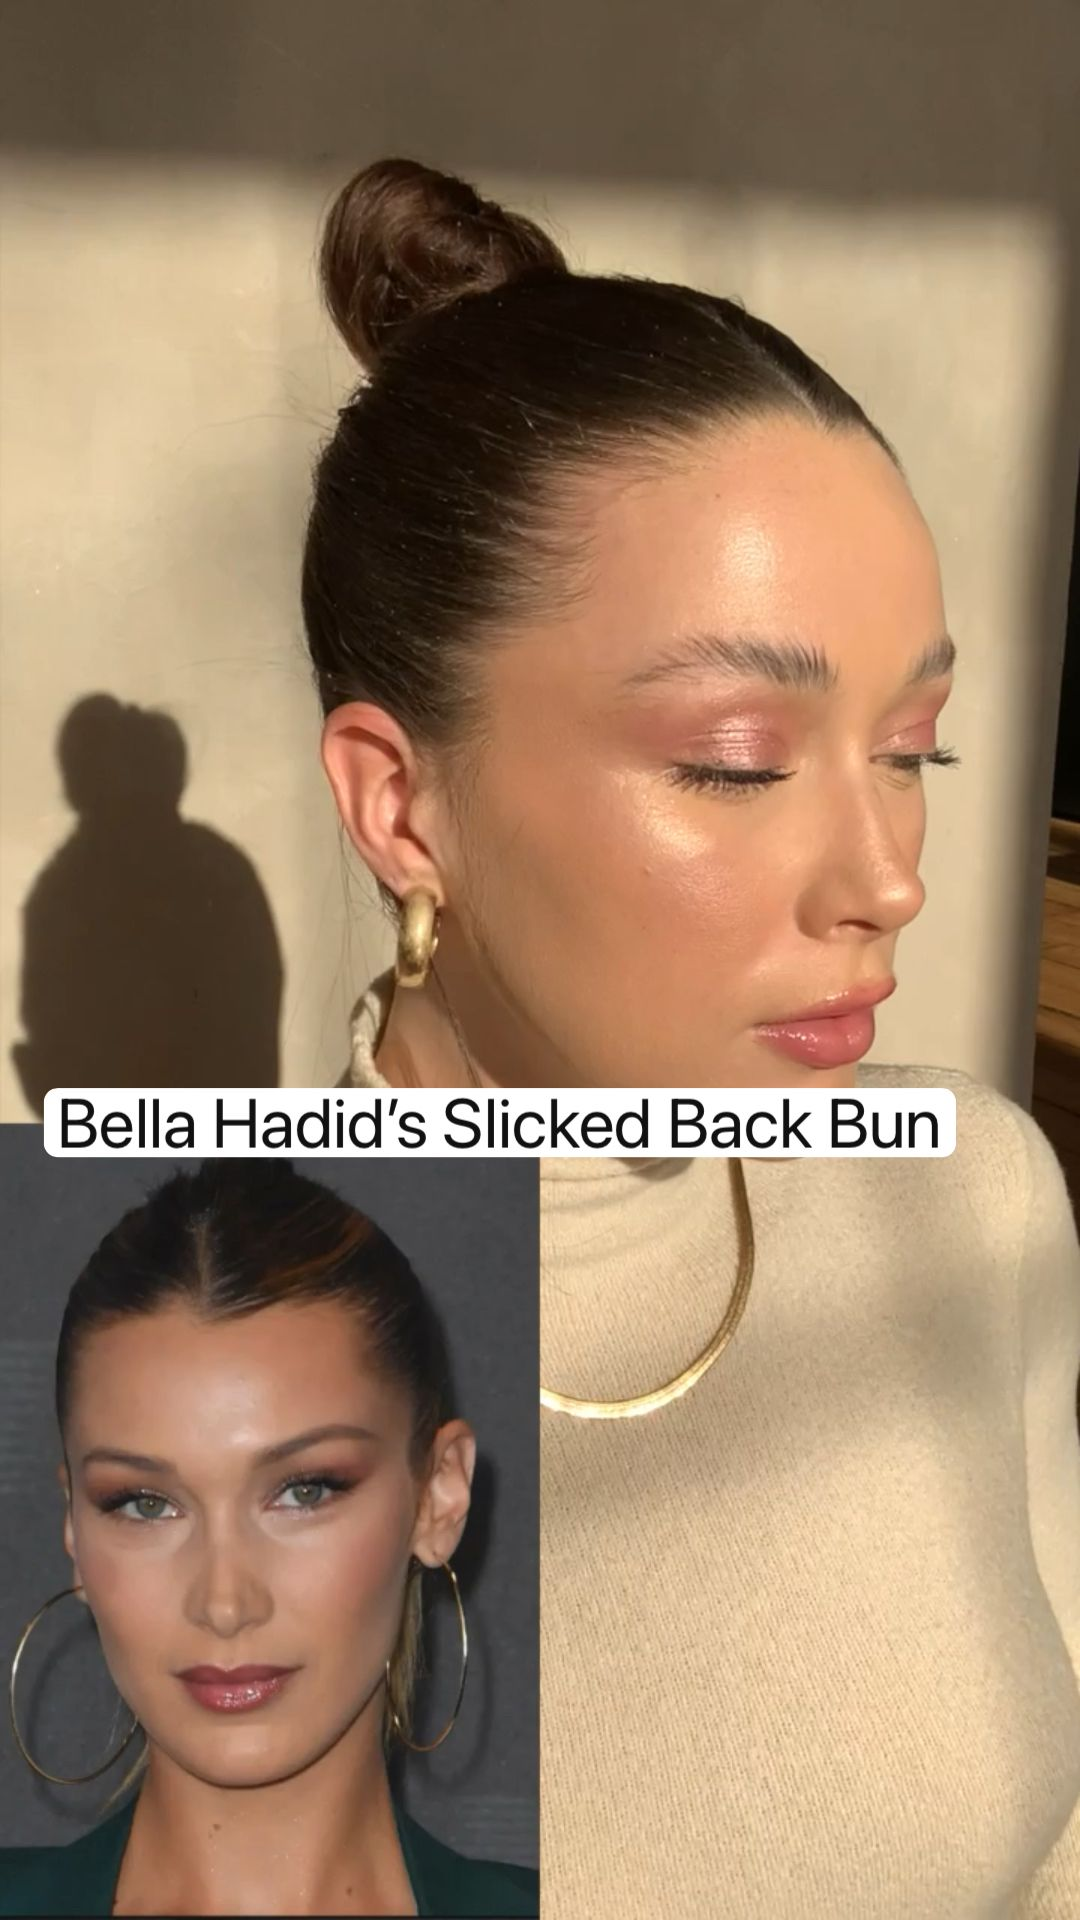 Bella Hadid's Slicked Back Bun